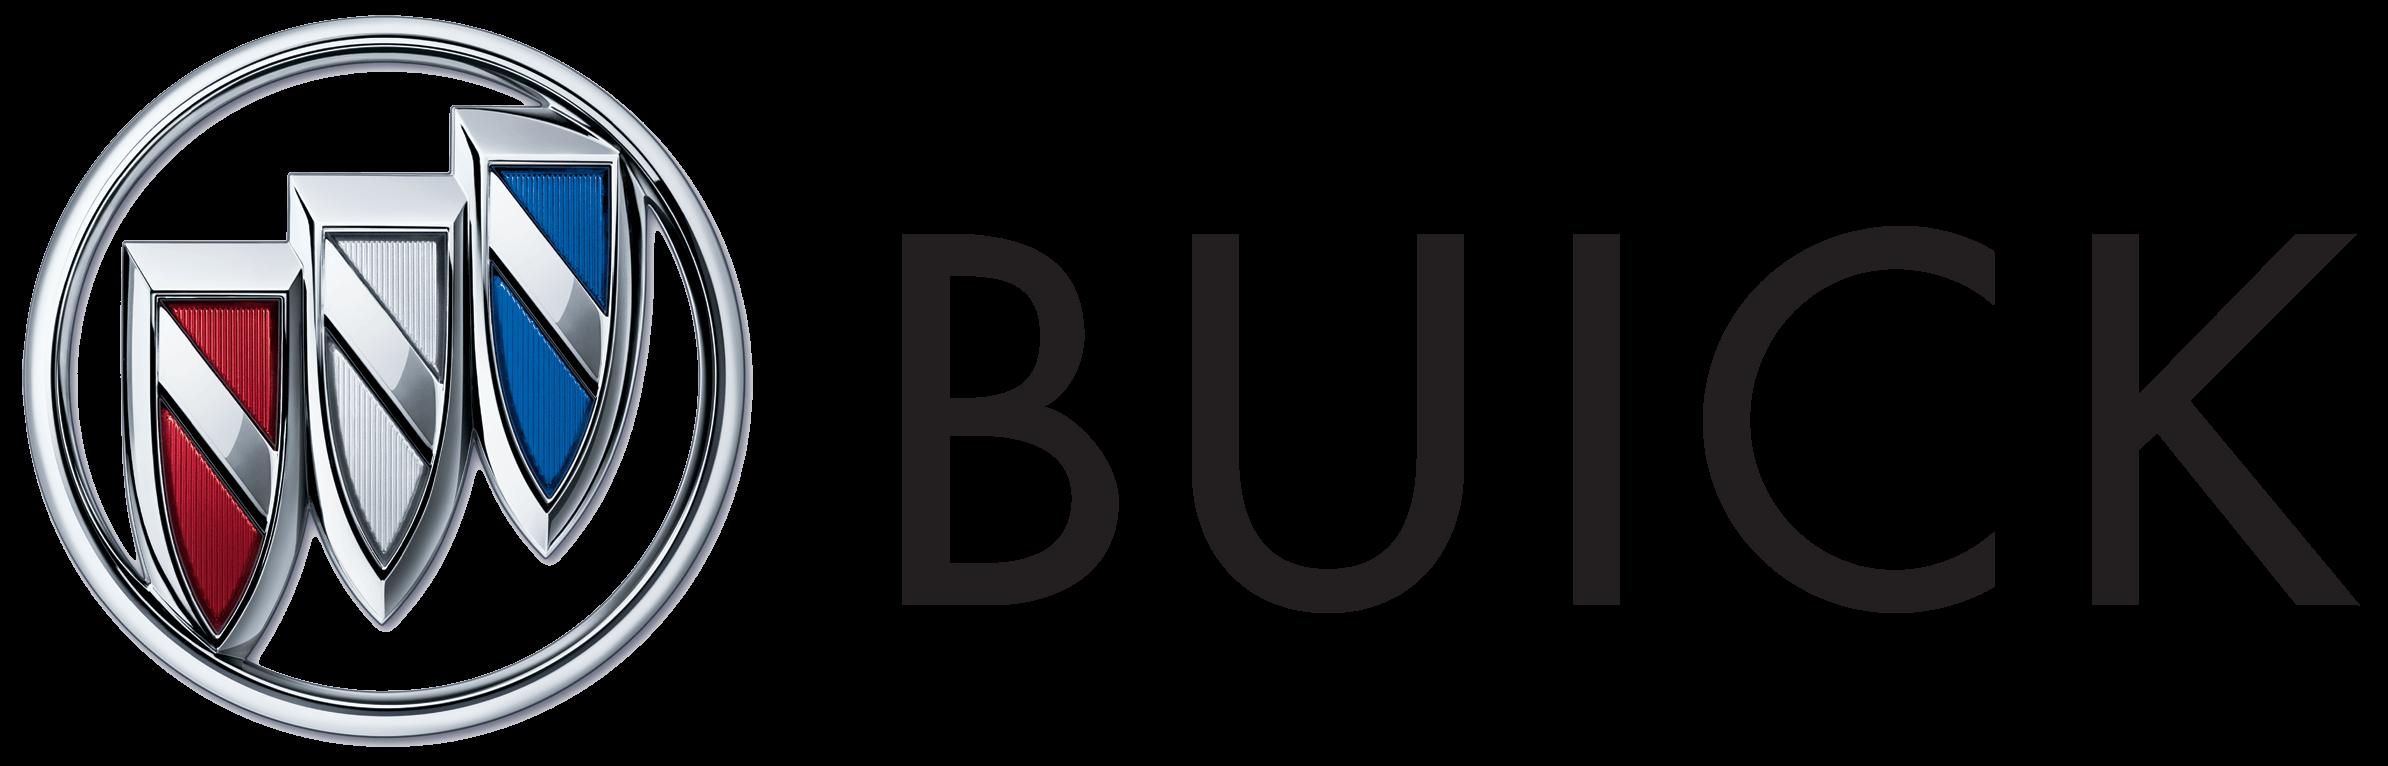 buick logo vector eps free download logo icons clipart rh freelogovectors net logo buick vectoriel buick logo vector free